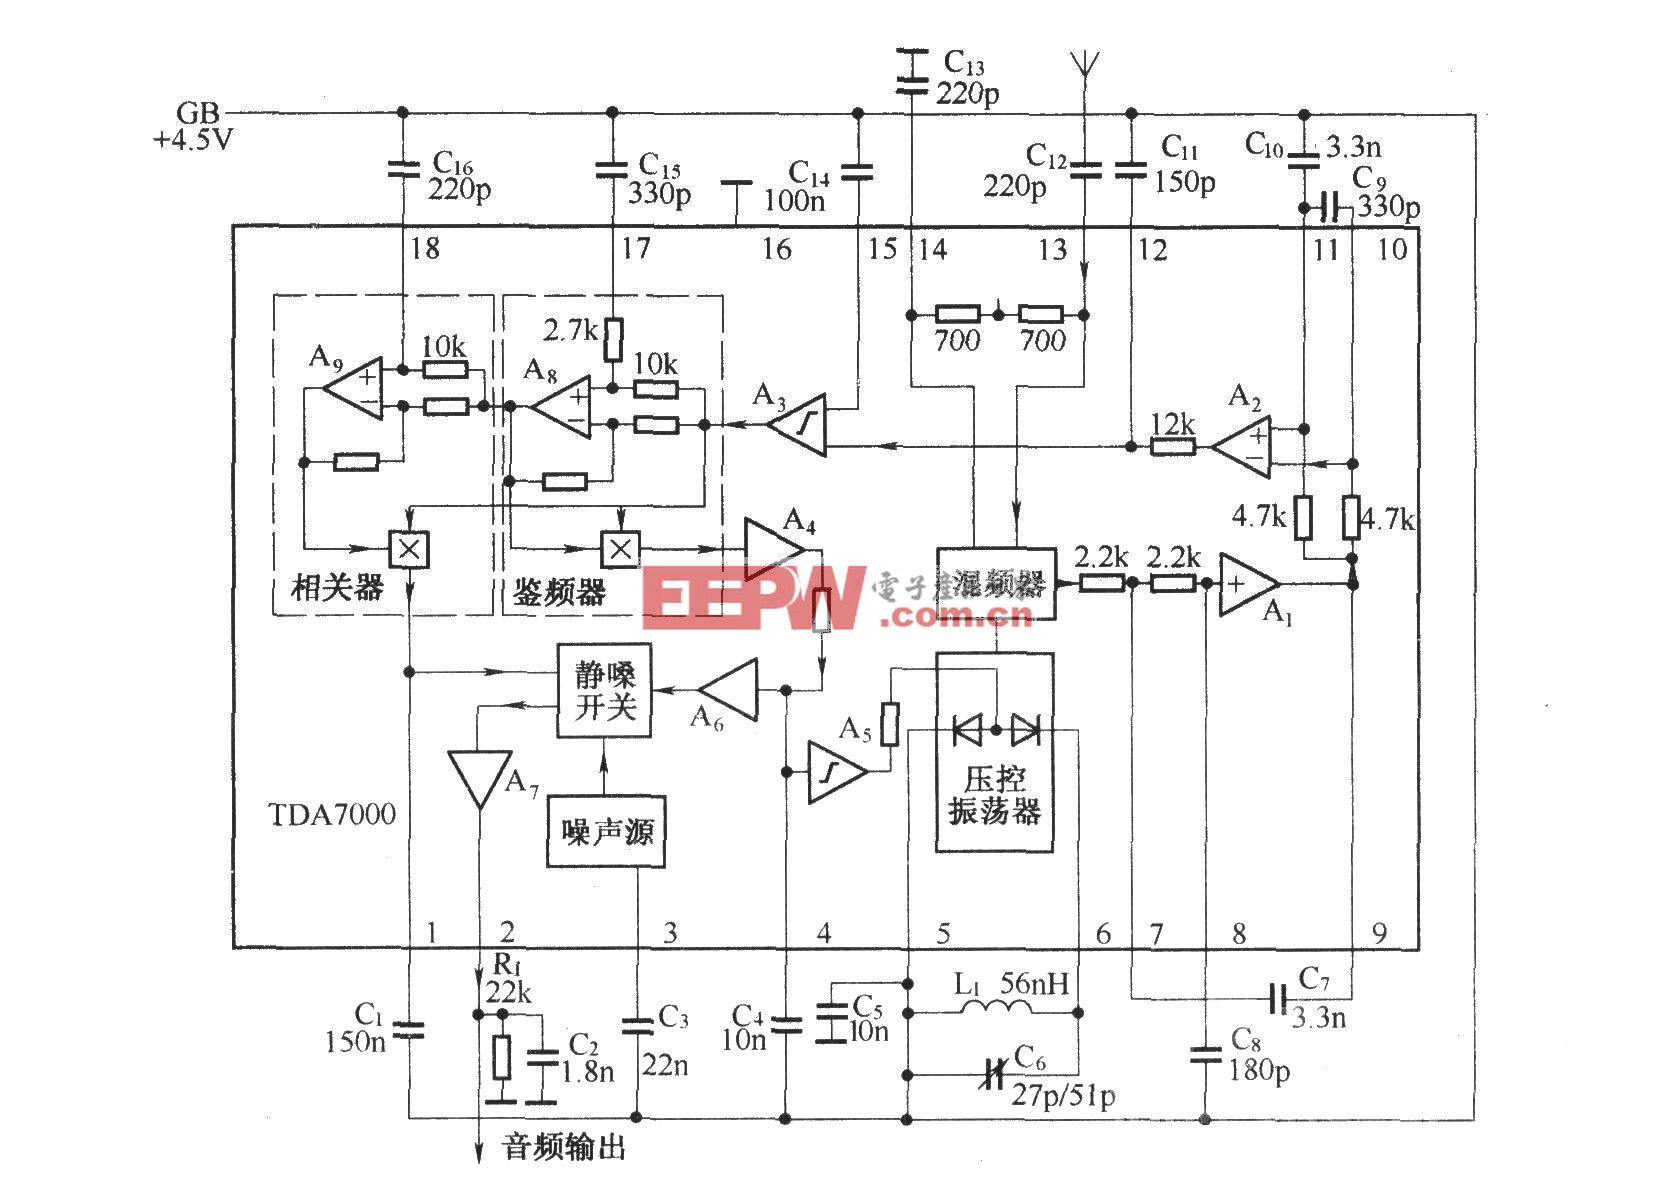 TDA7000的内电路及其组成的基本接收电路